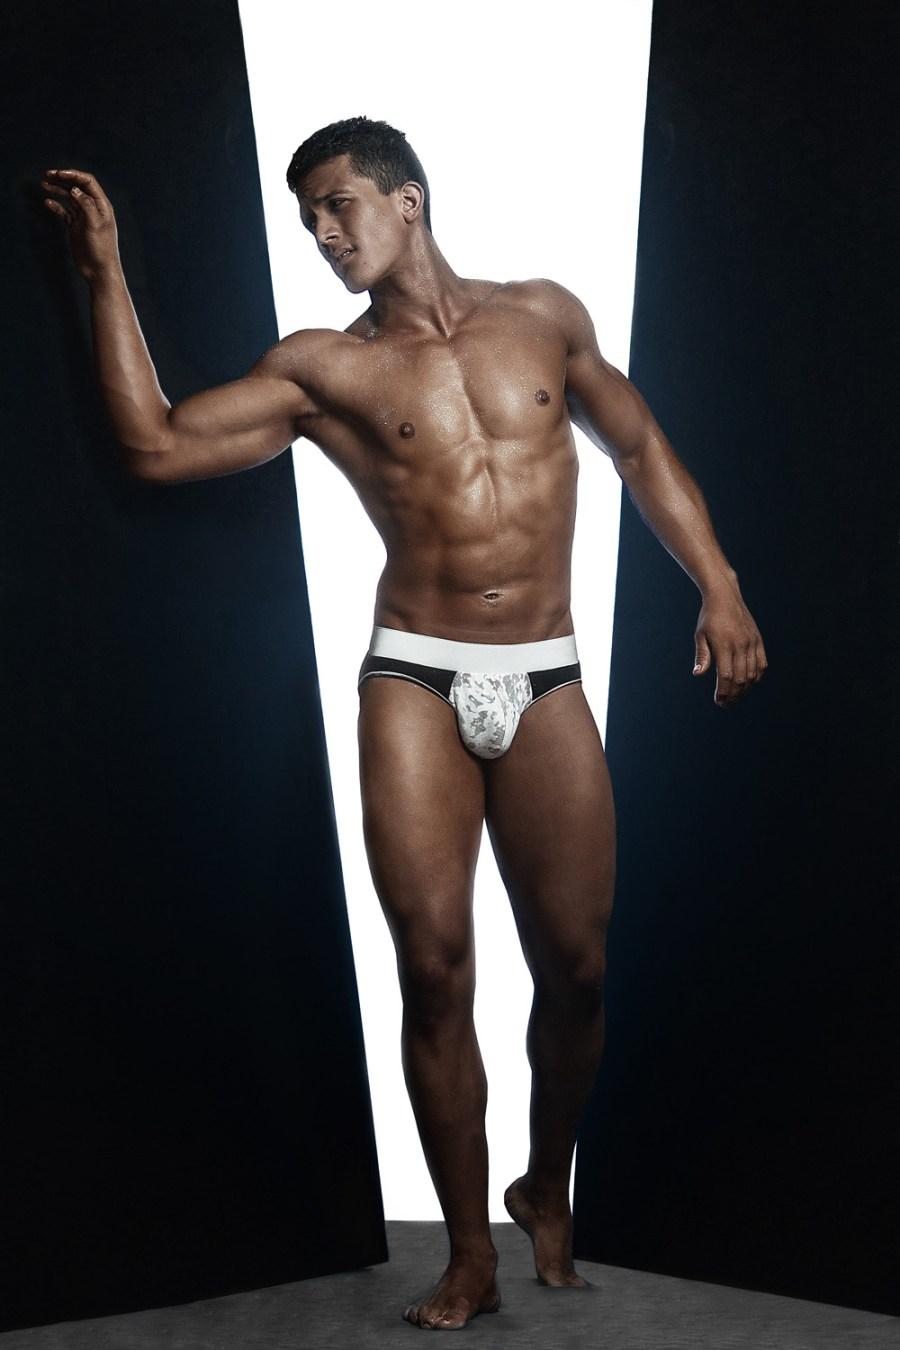 Erik Ramos by Chris Femat for Fashionably Male419